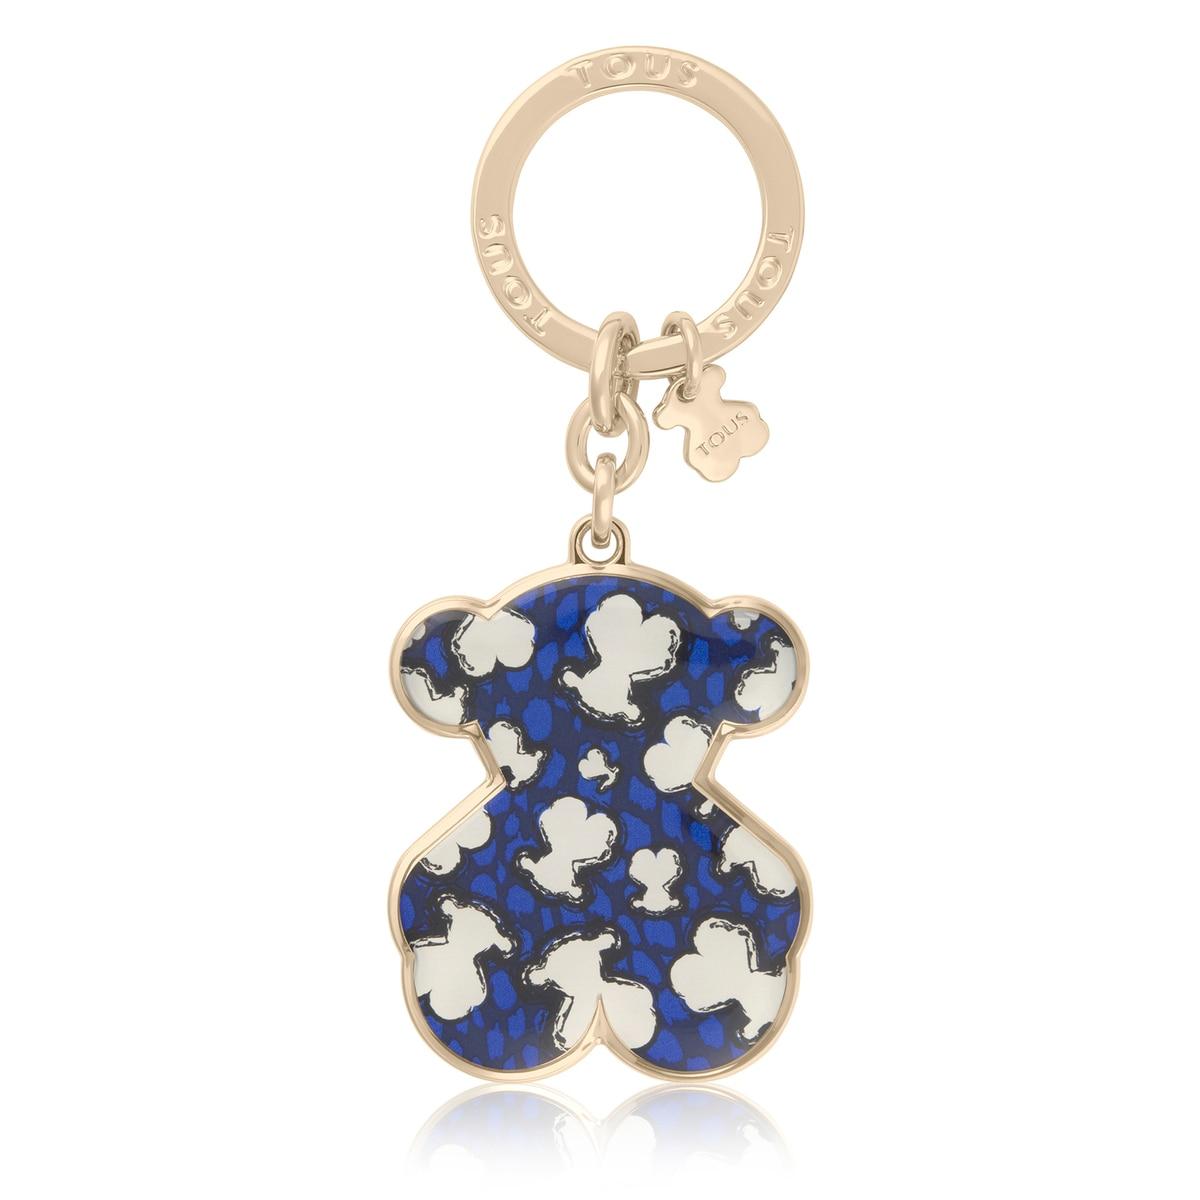 Lene Leo blue bear keychain